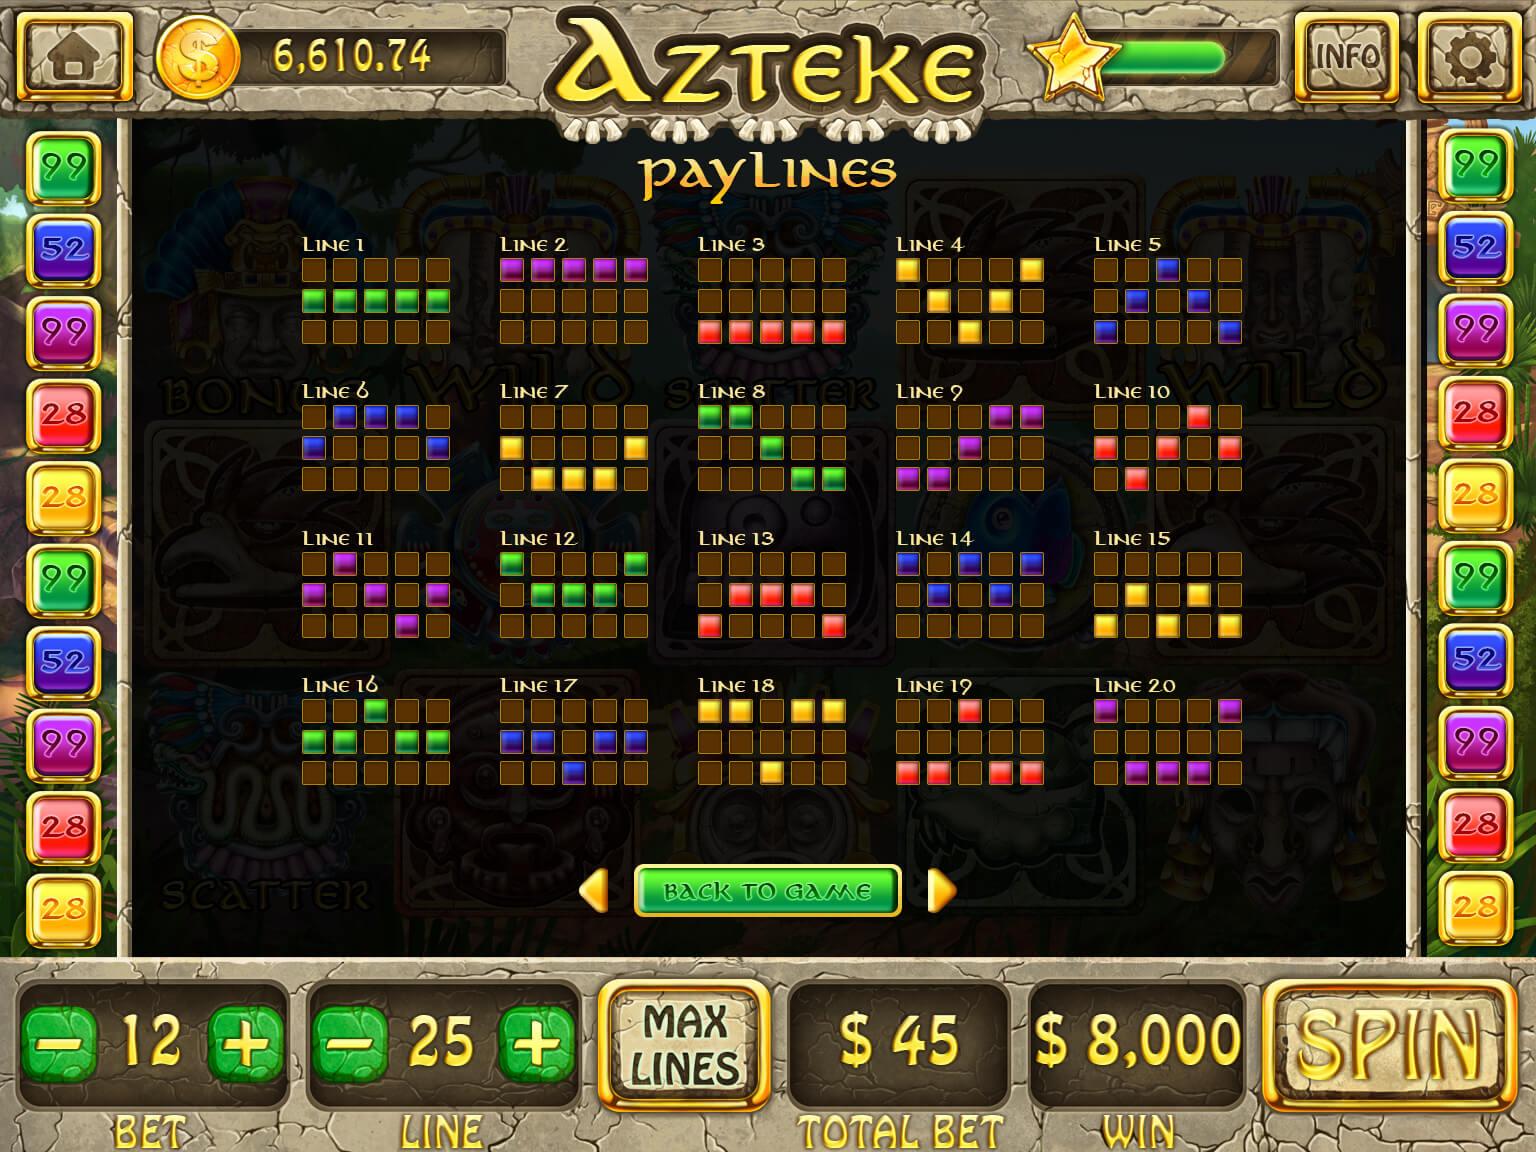 Aztek slot machine